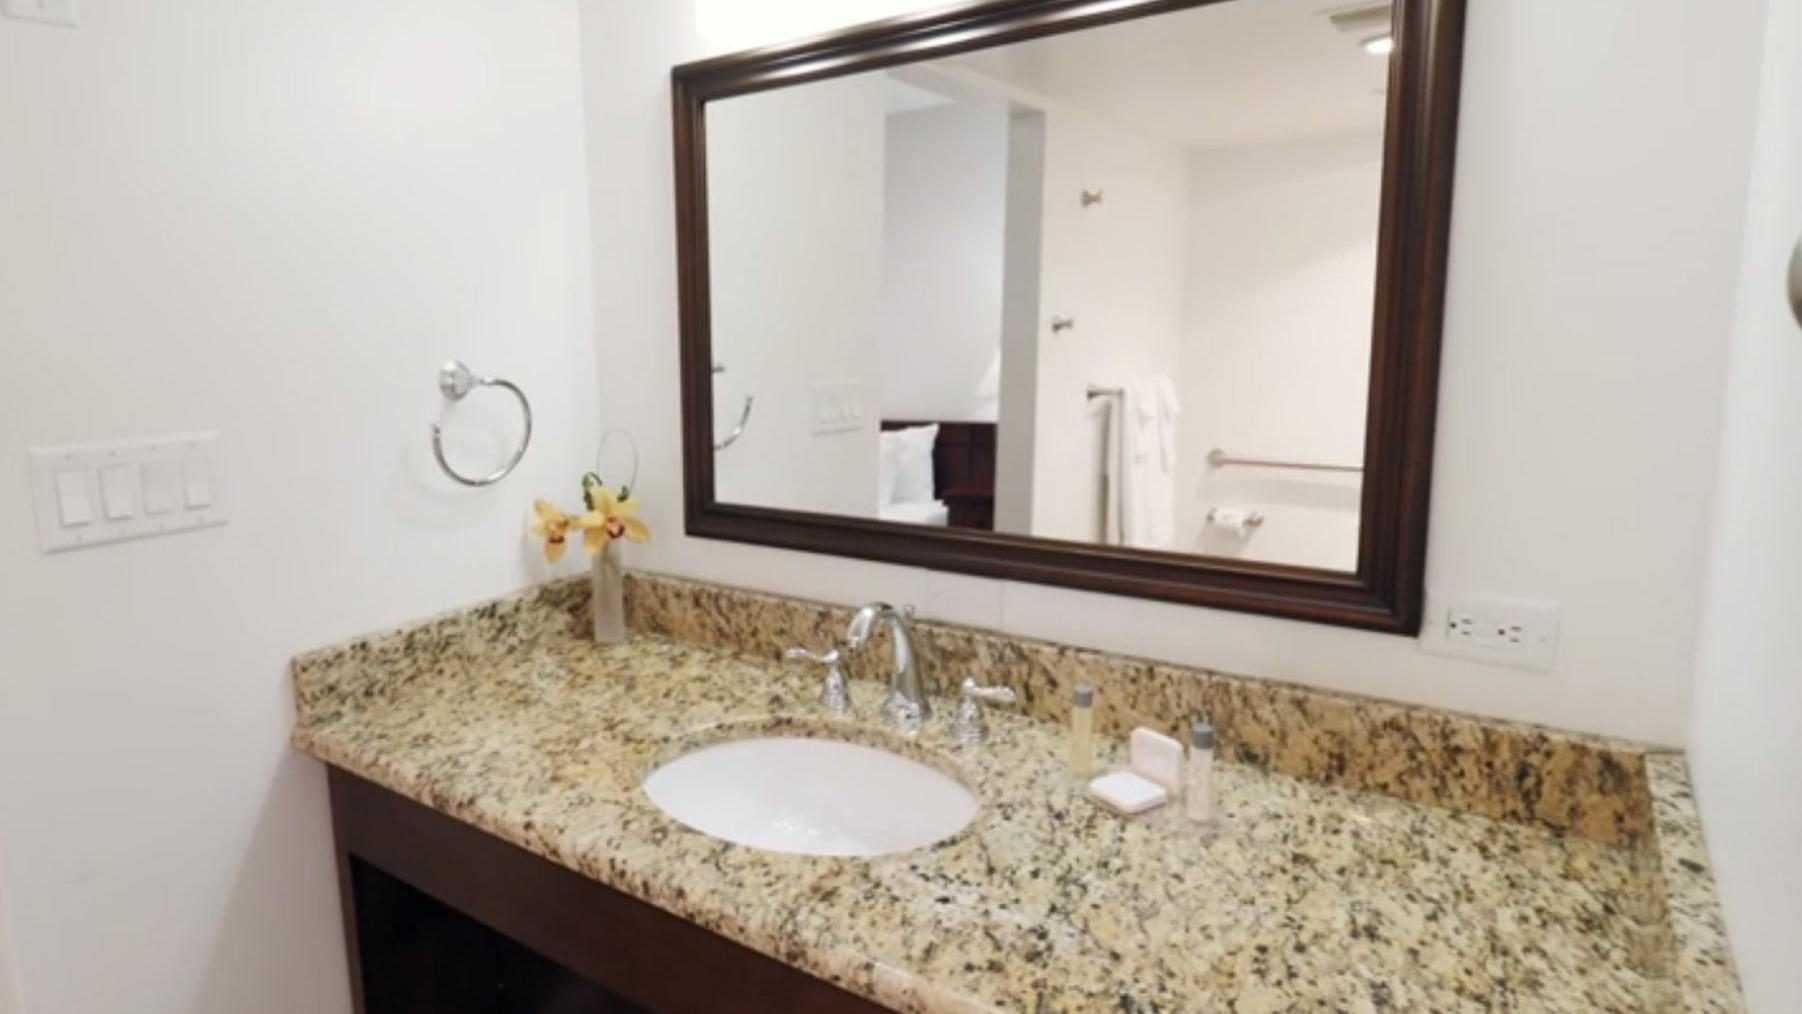 Luxury Sedona hotel bathroom with granite countertops